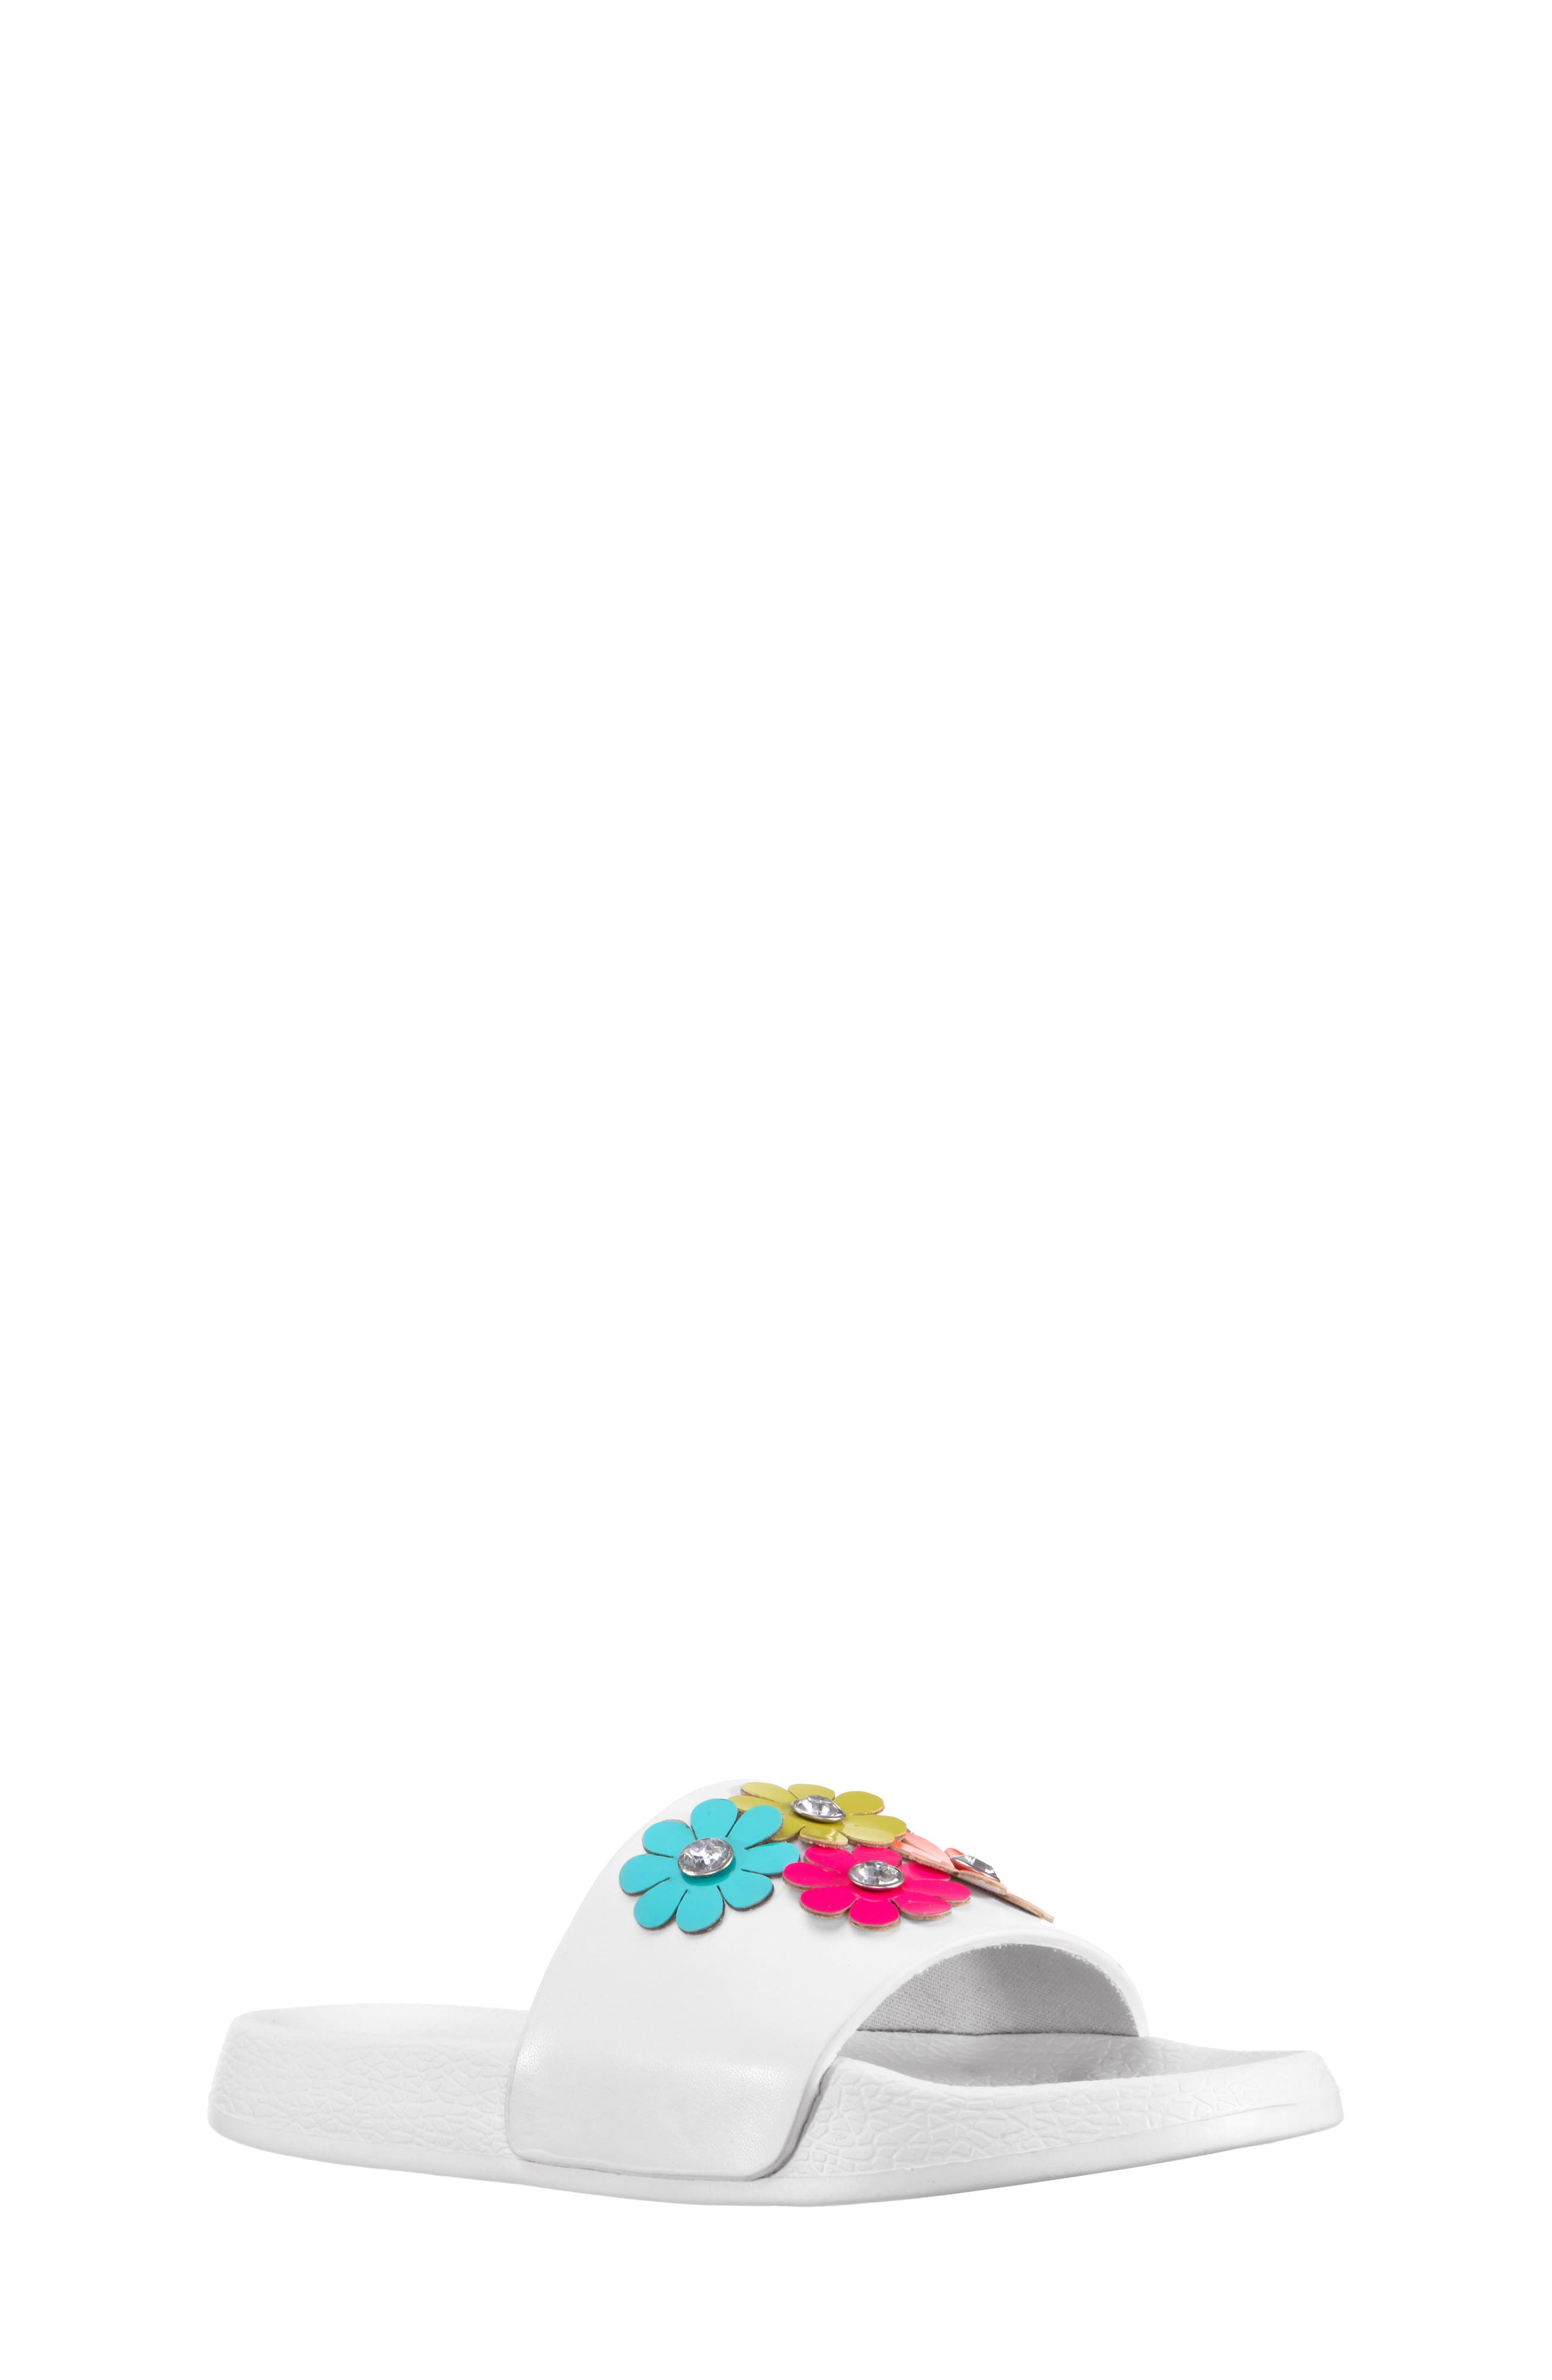 Flowermaid Embellished Slide Sandal,                         Main,                         color, White Smooth